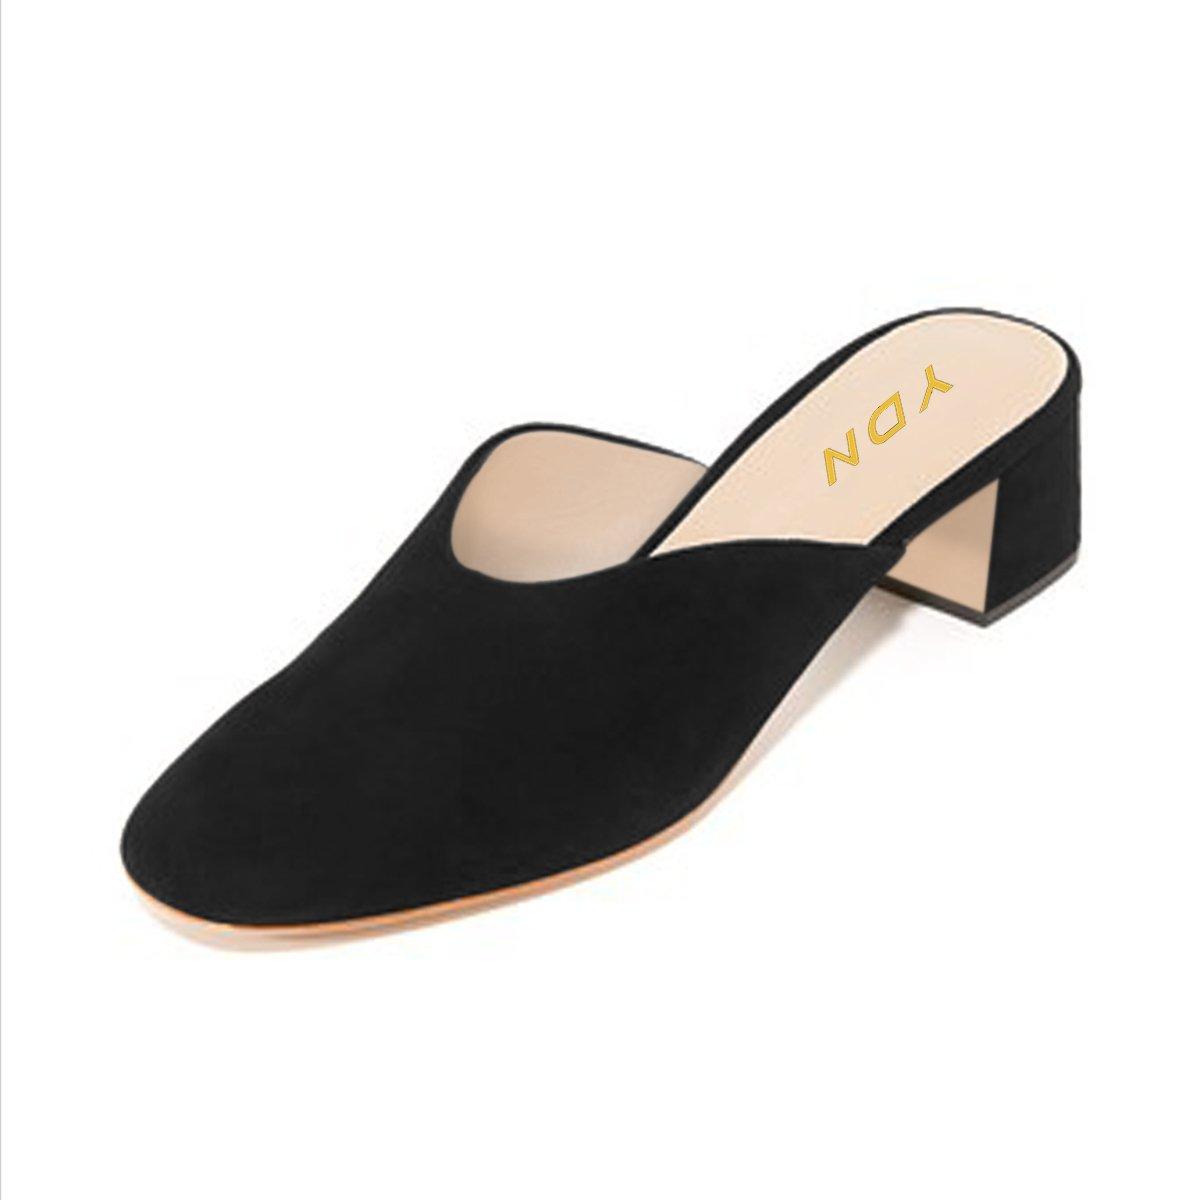 YDN Women Block Low Heels Mules Slip on Clogs Round Toe Pumps Slide Casual Slipper Black 10 by YDN